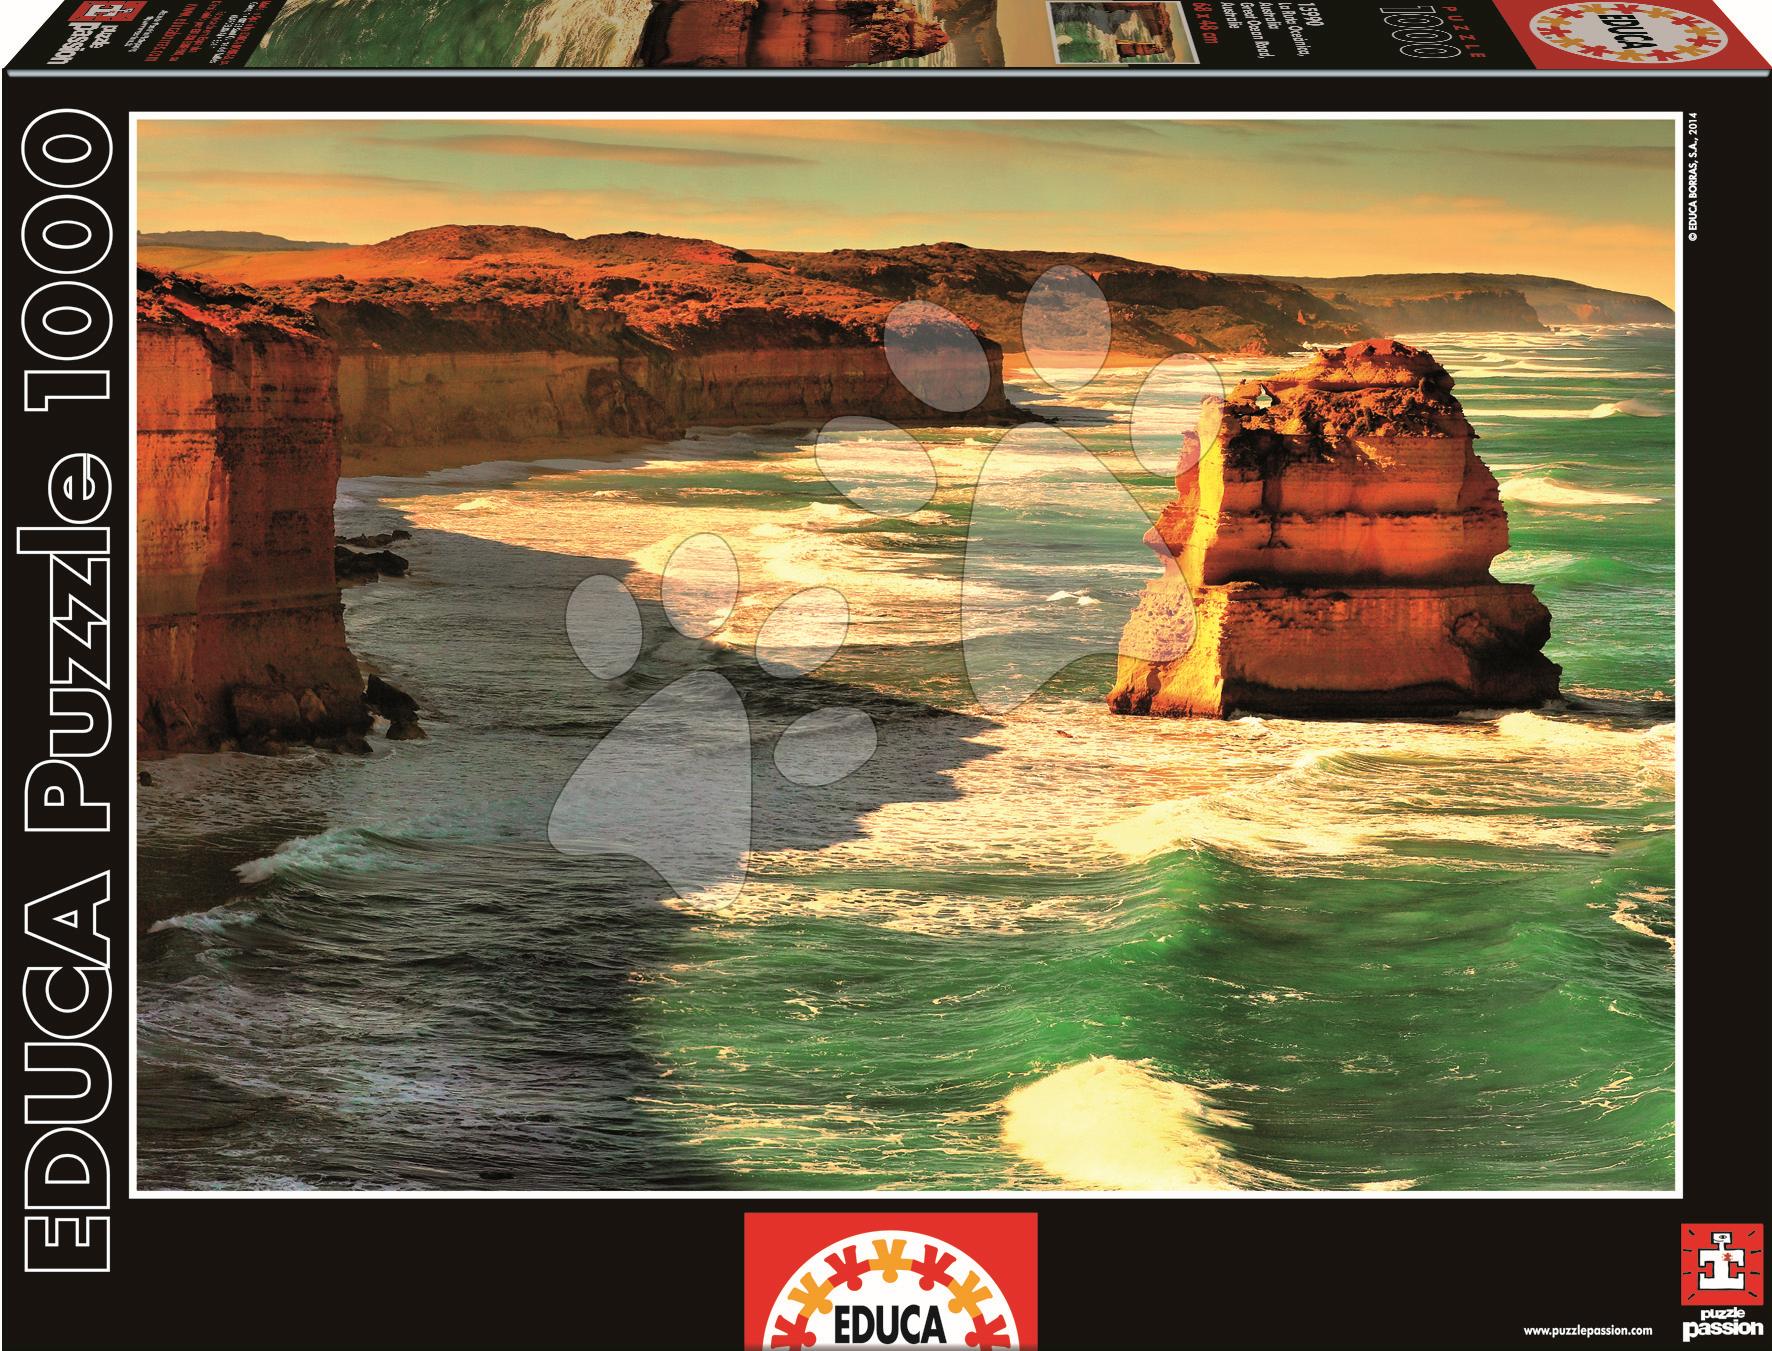 Puzzle 1000 dielne - Puzzle Genuine Great Ocean Road Educa 1000 dielov od 12 rokov